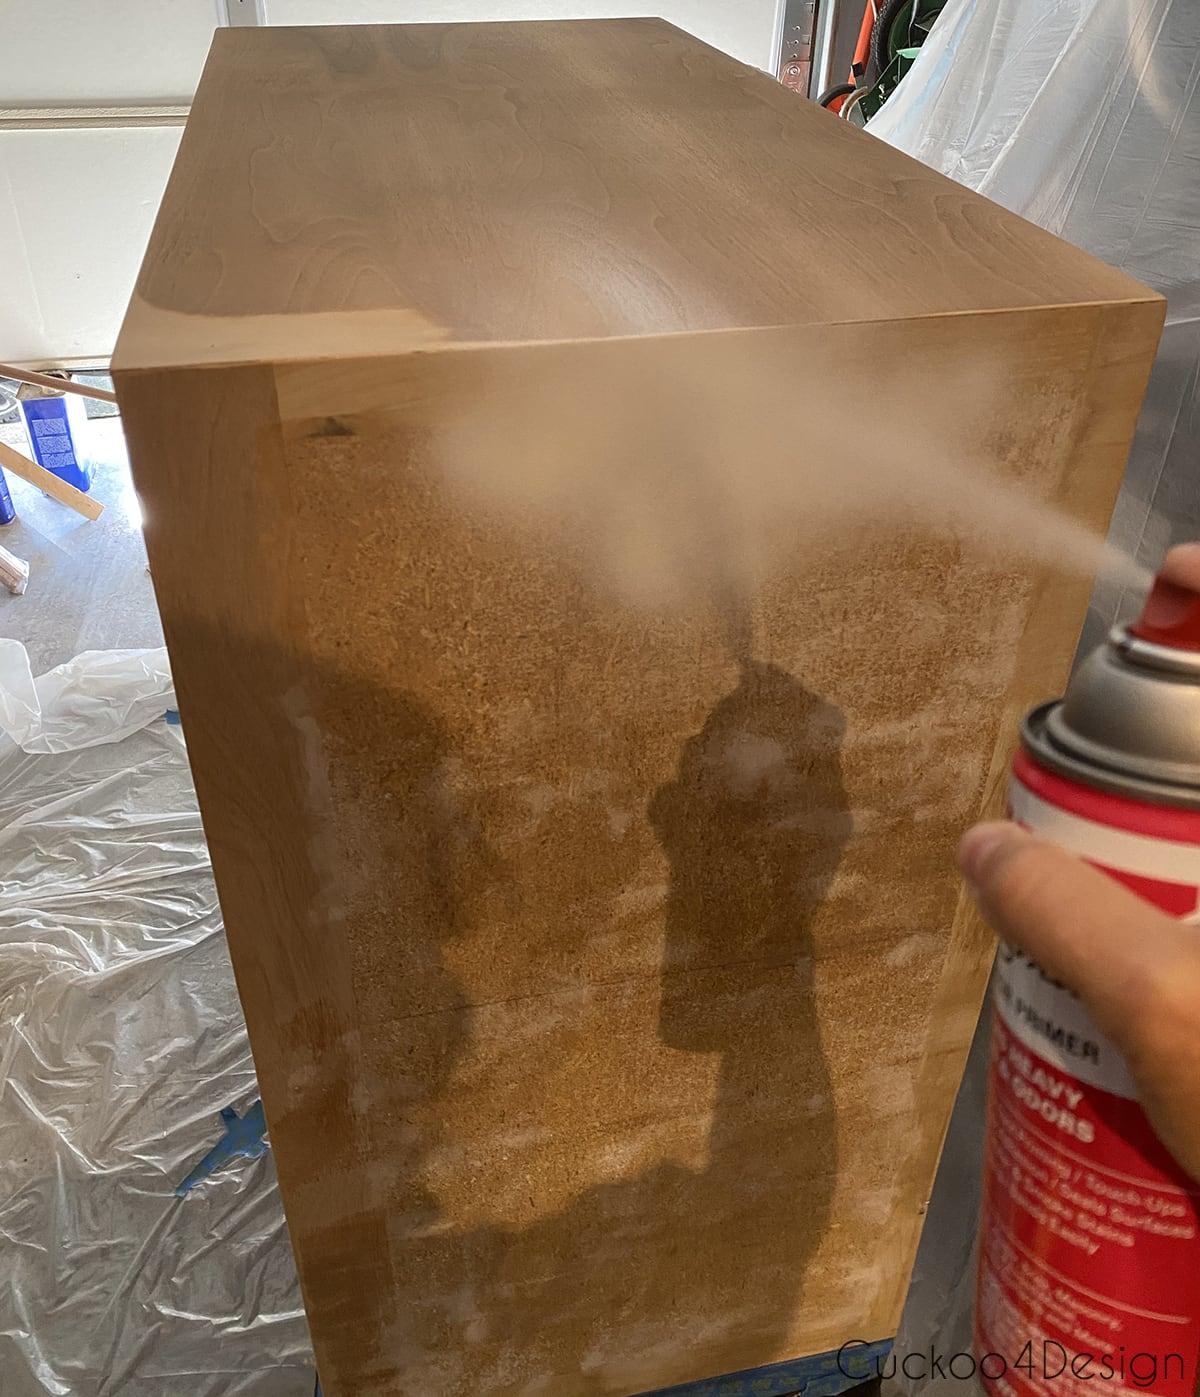 spraying kilz primer on dresser